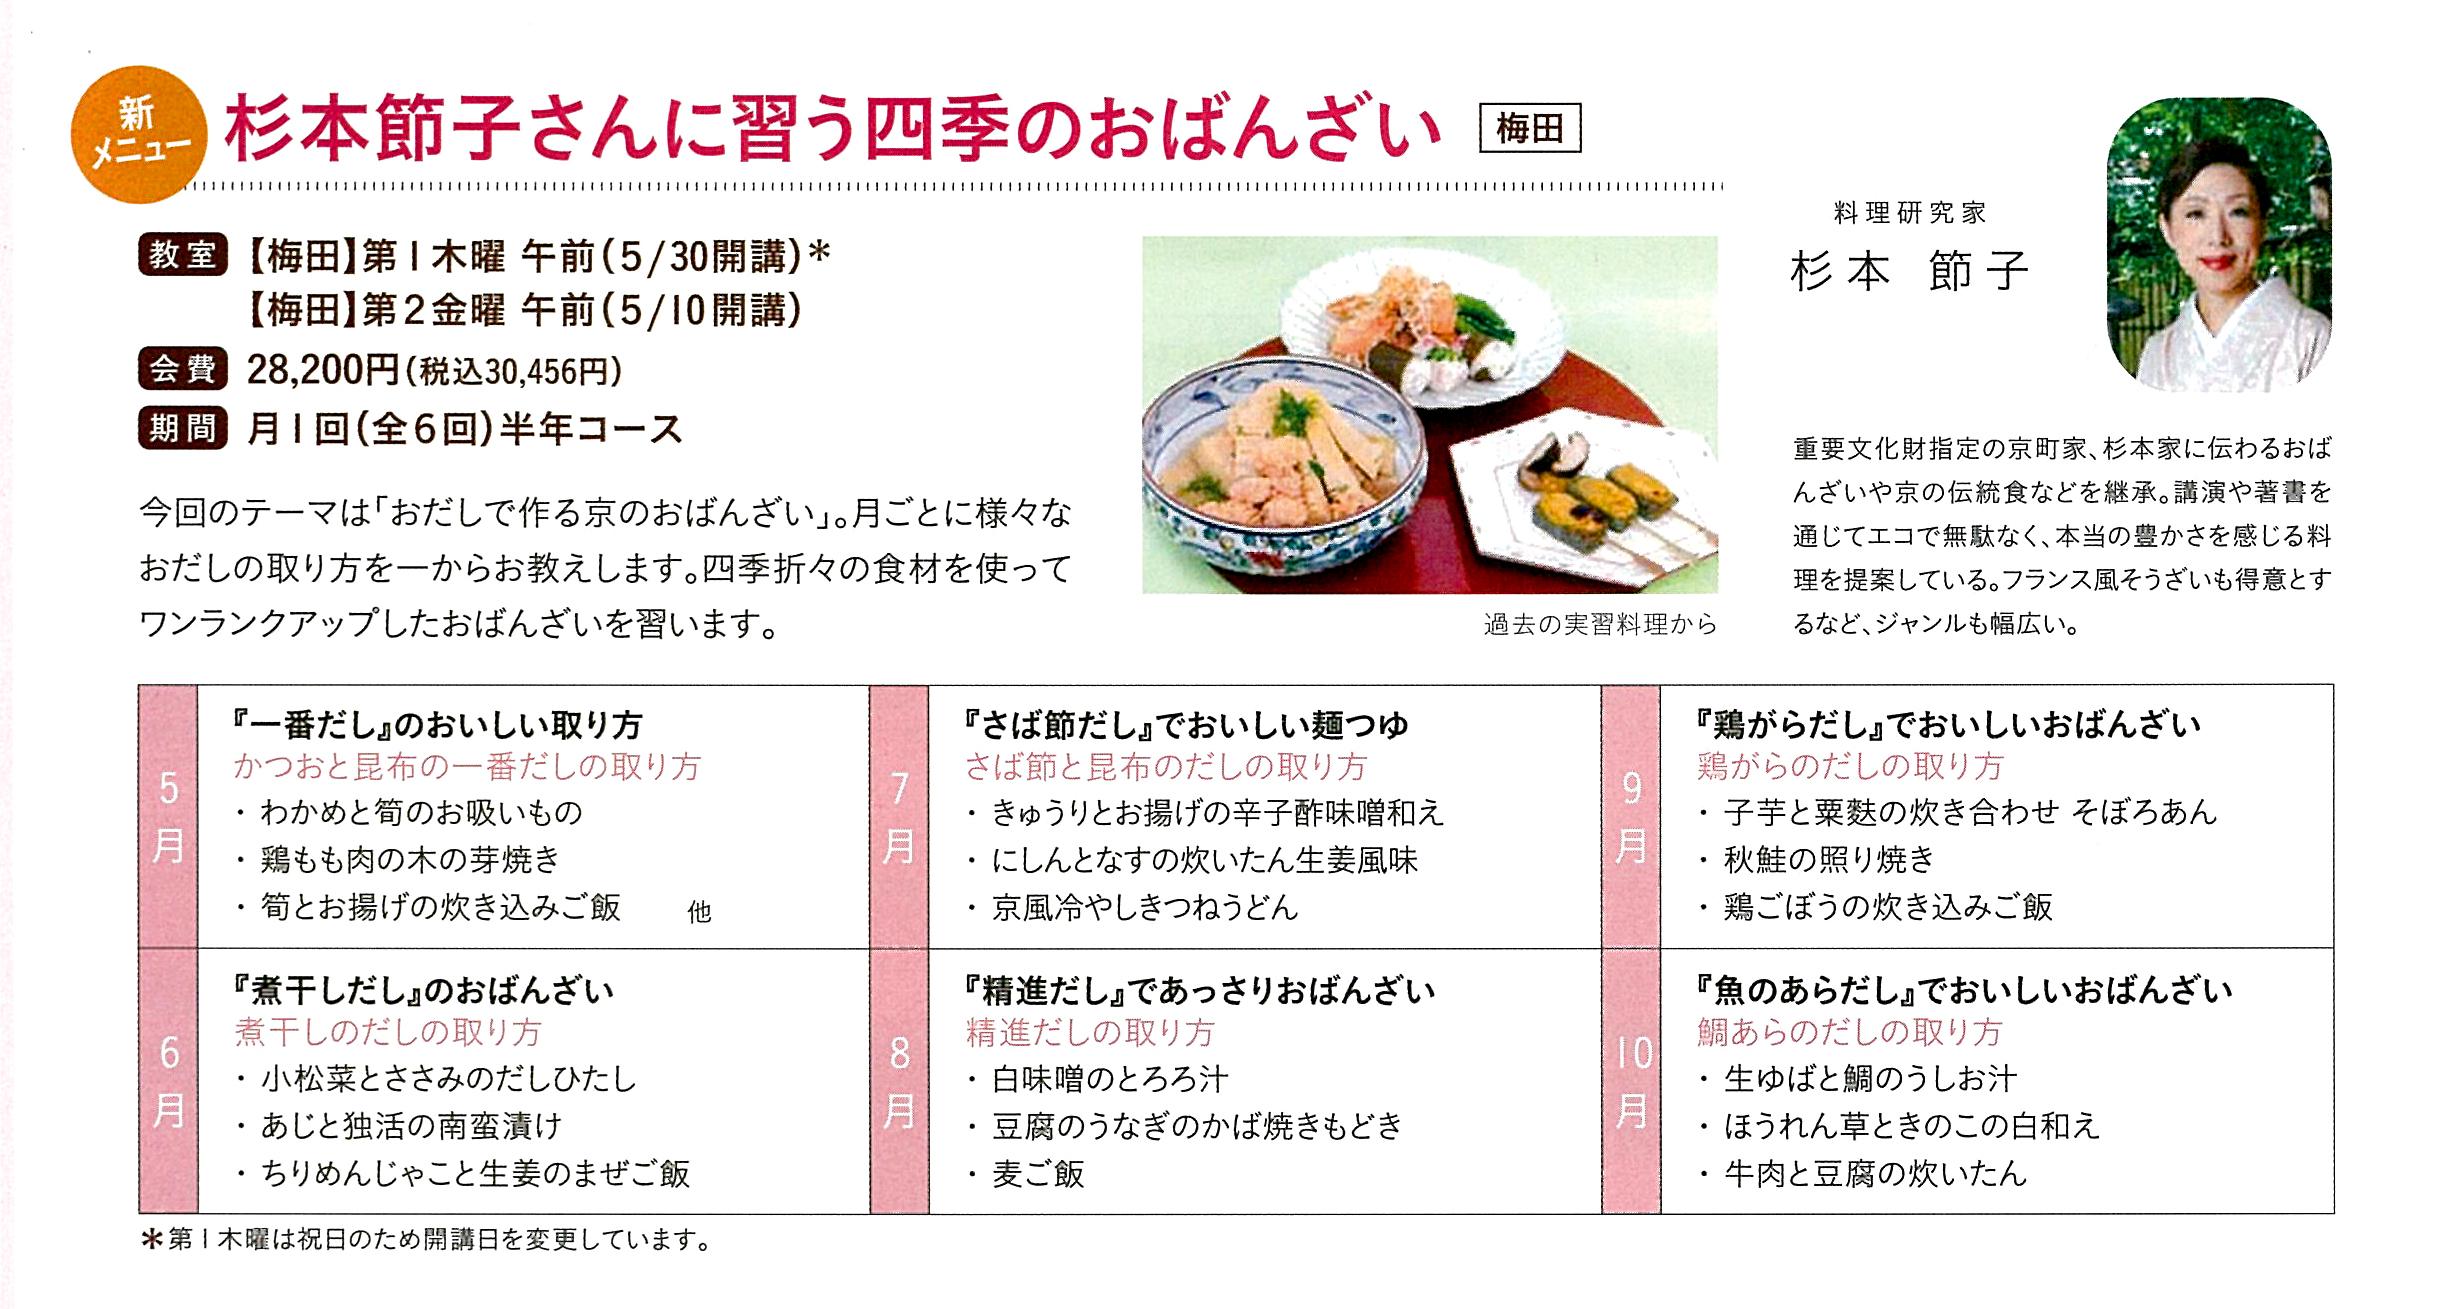 http://www.kyoto-obanzai.jp/blog/upimages/2019/03/20190214%E3%83%99%E3%82%BF%E3%83%BC%E3%83%9B%E3%83%BC%E3%83%A0.jpg